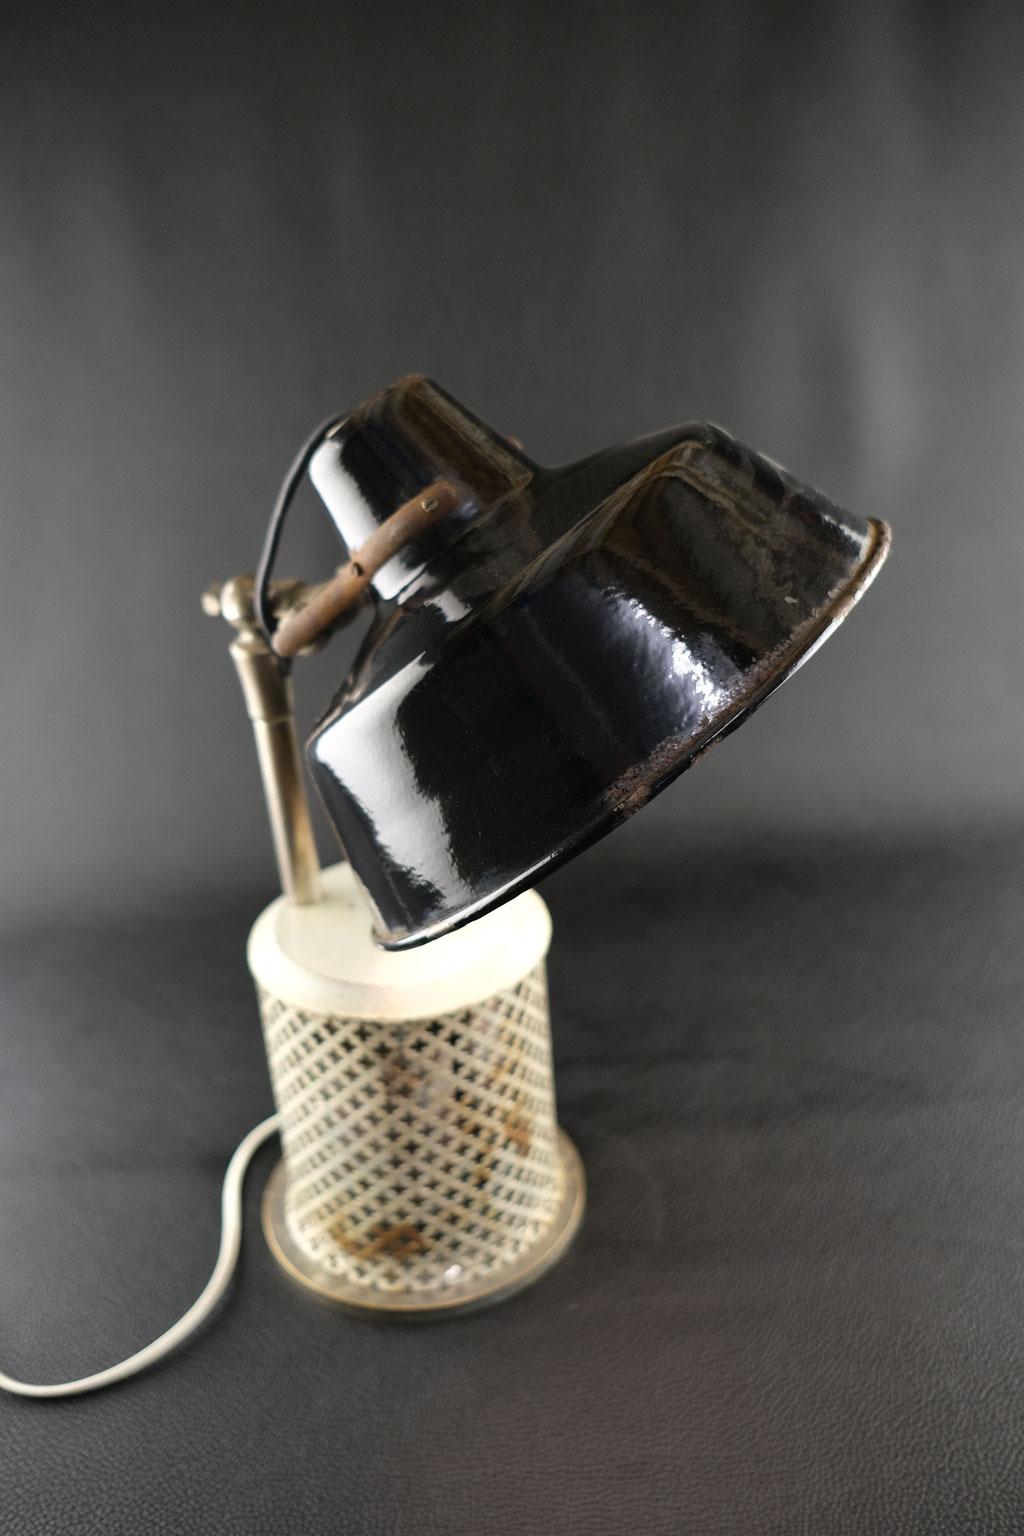 Lampe, Lichtobjekt, Bestrahlungslampe, Kunst, Lichtskulptur, Wolfgang Wallner, Hall in Tirol